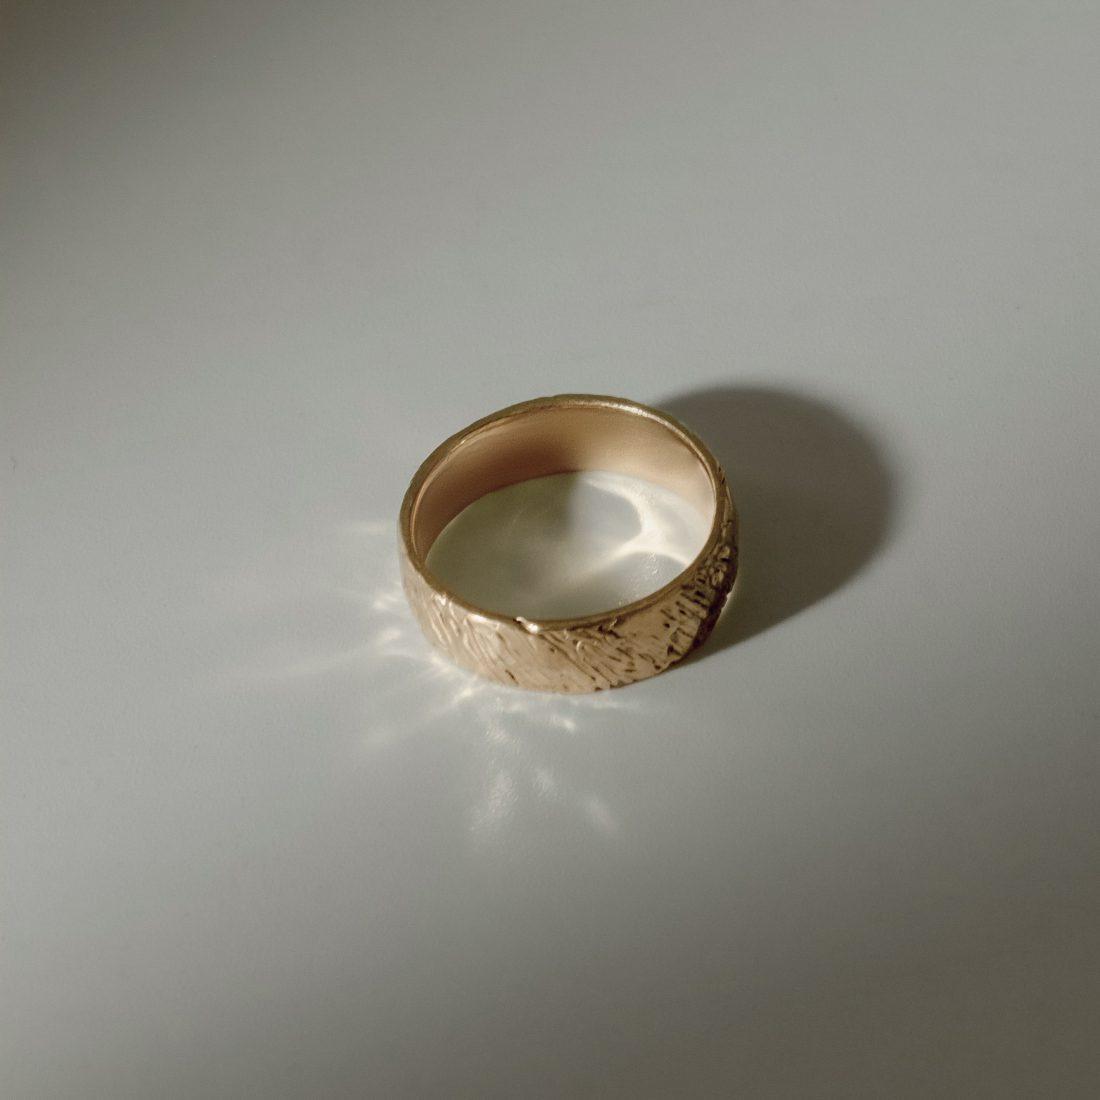 Кольцо «Кора» с четырмя камнями, позолота 3